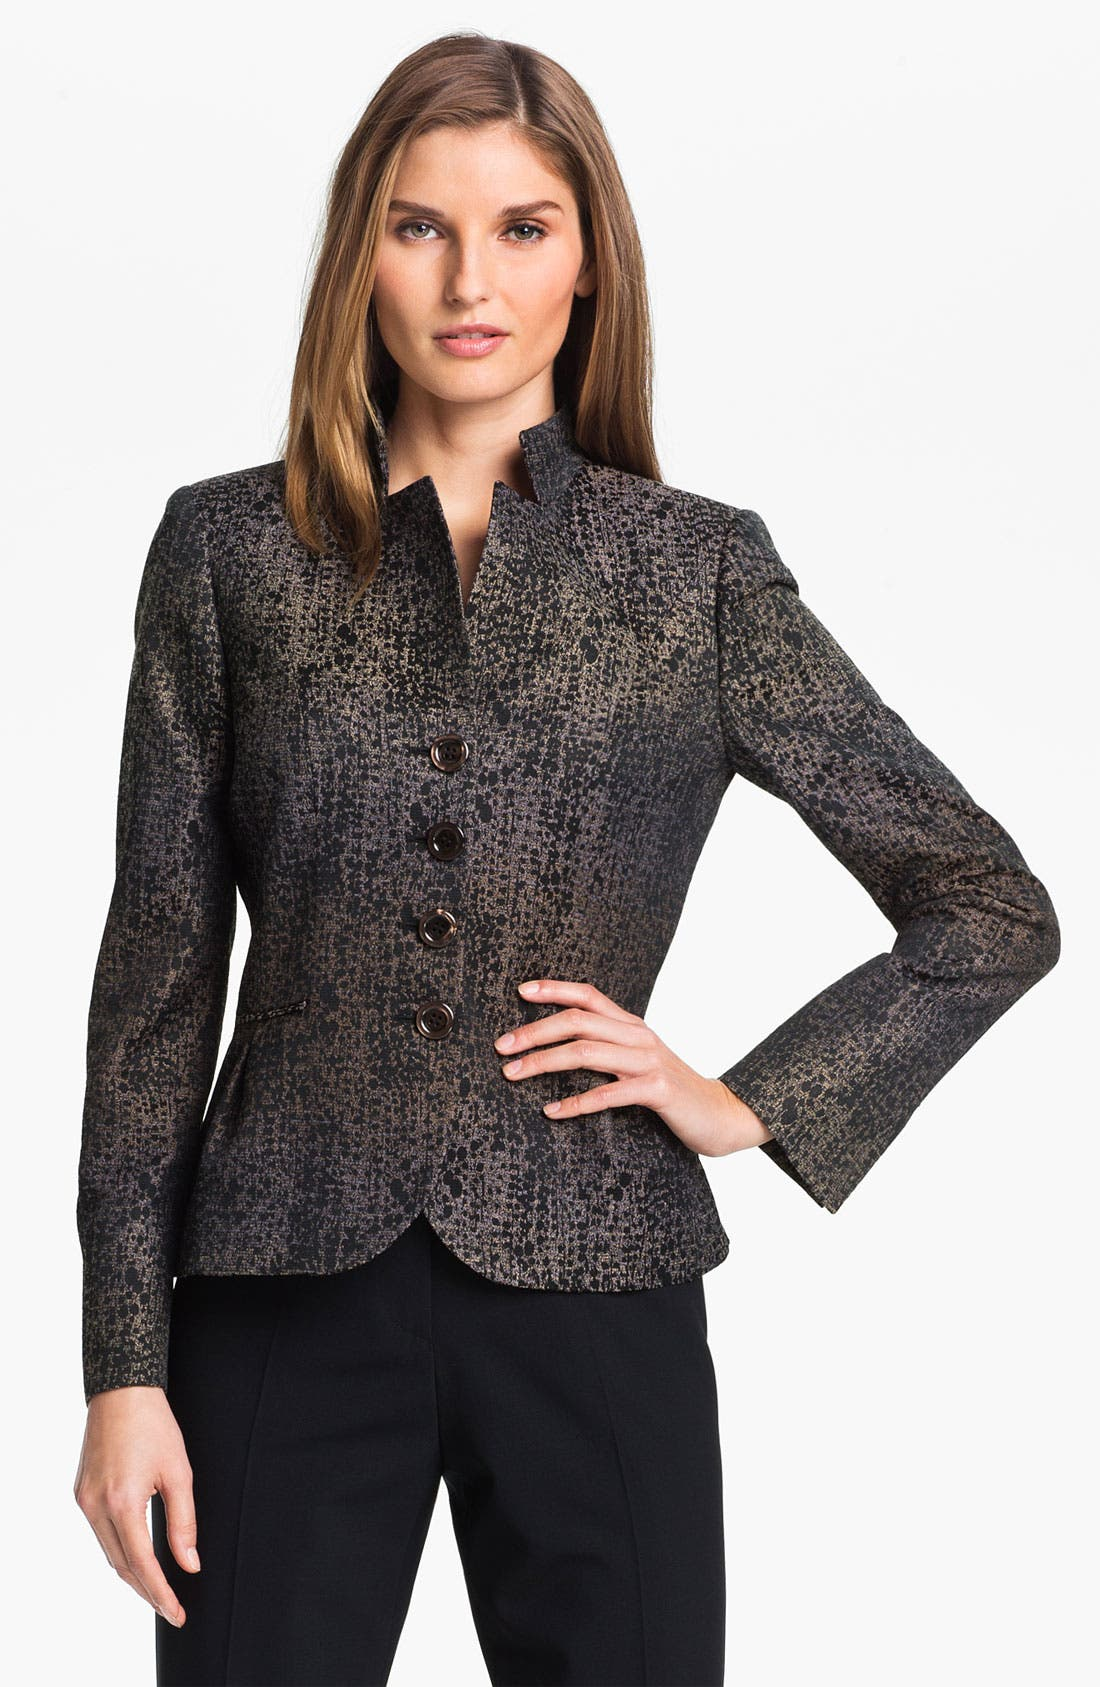 Alternate Image 1 Selected - Santorelli 'Caryn 1' Jacket